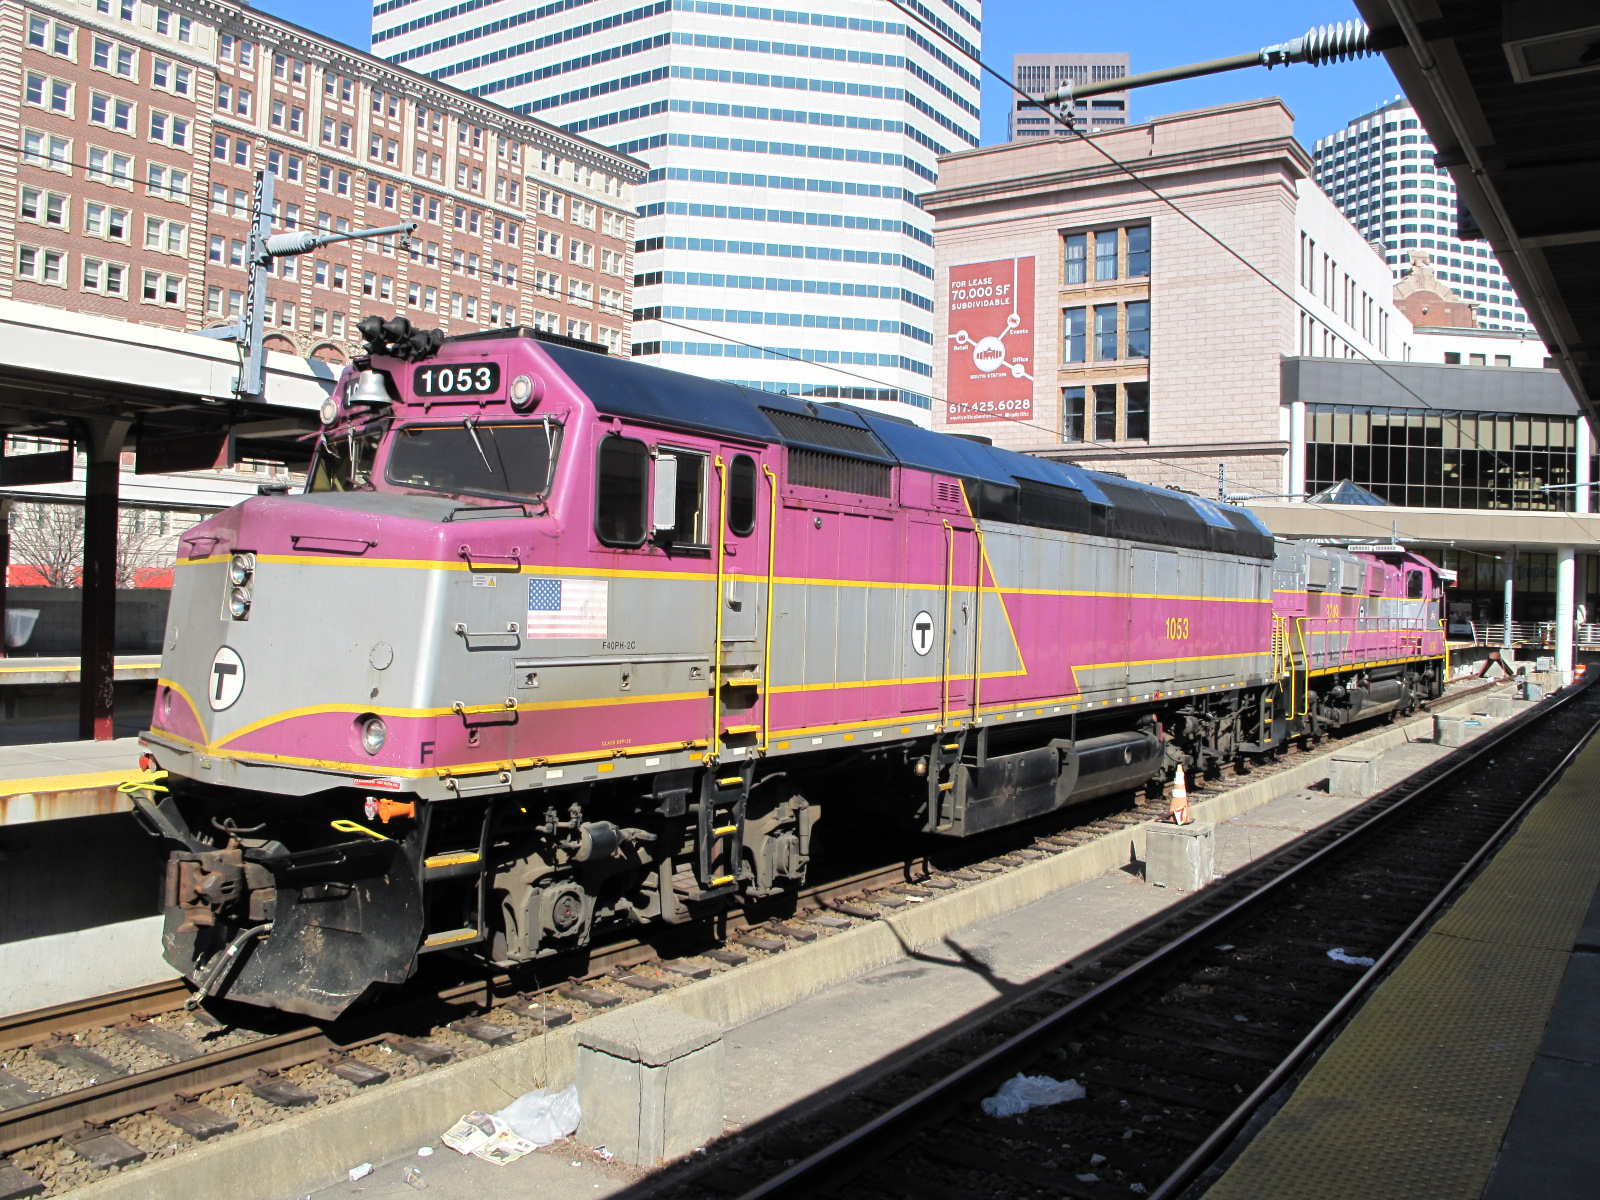 File:MBTA EMD F40PH JPG - Wikimedia Commons